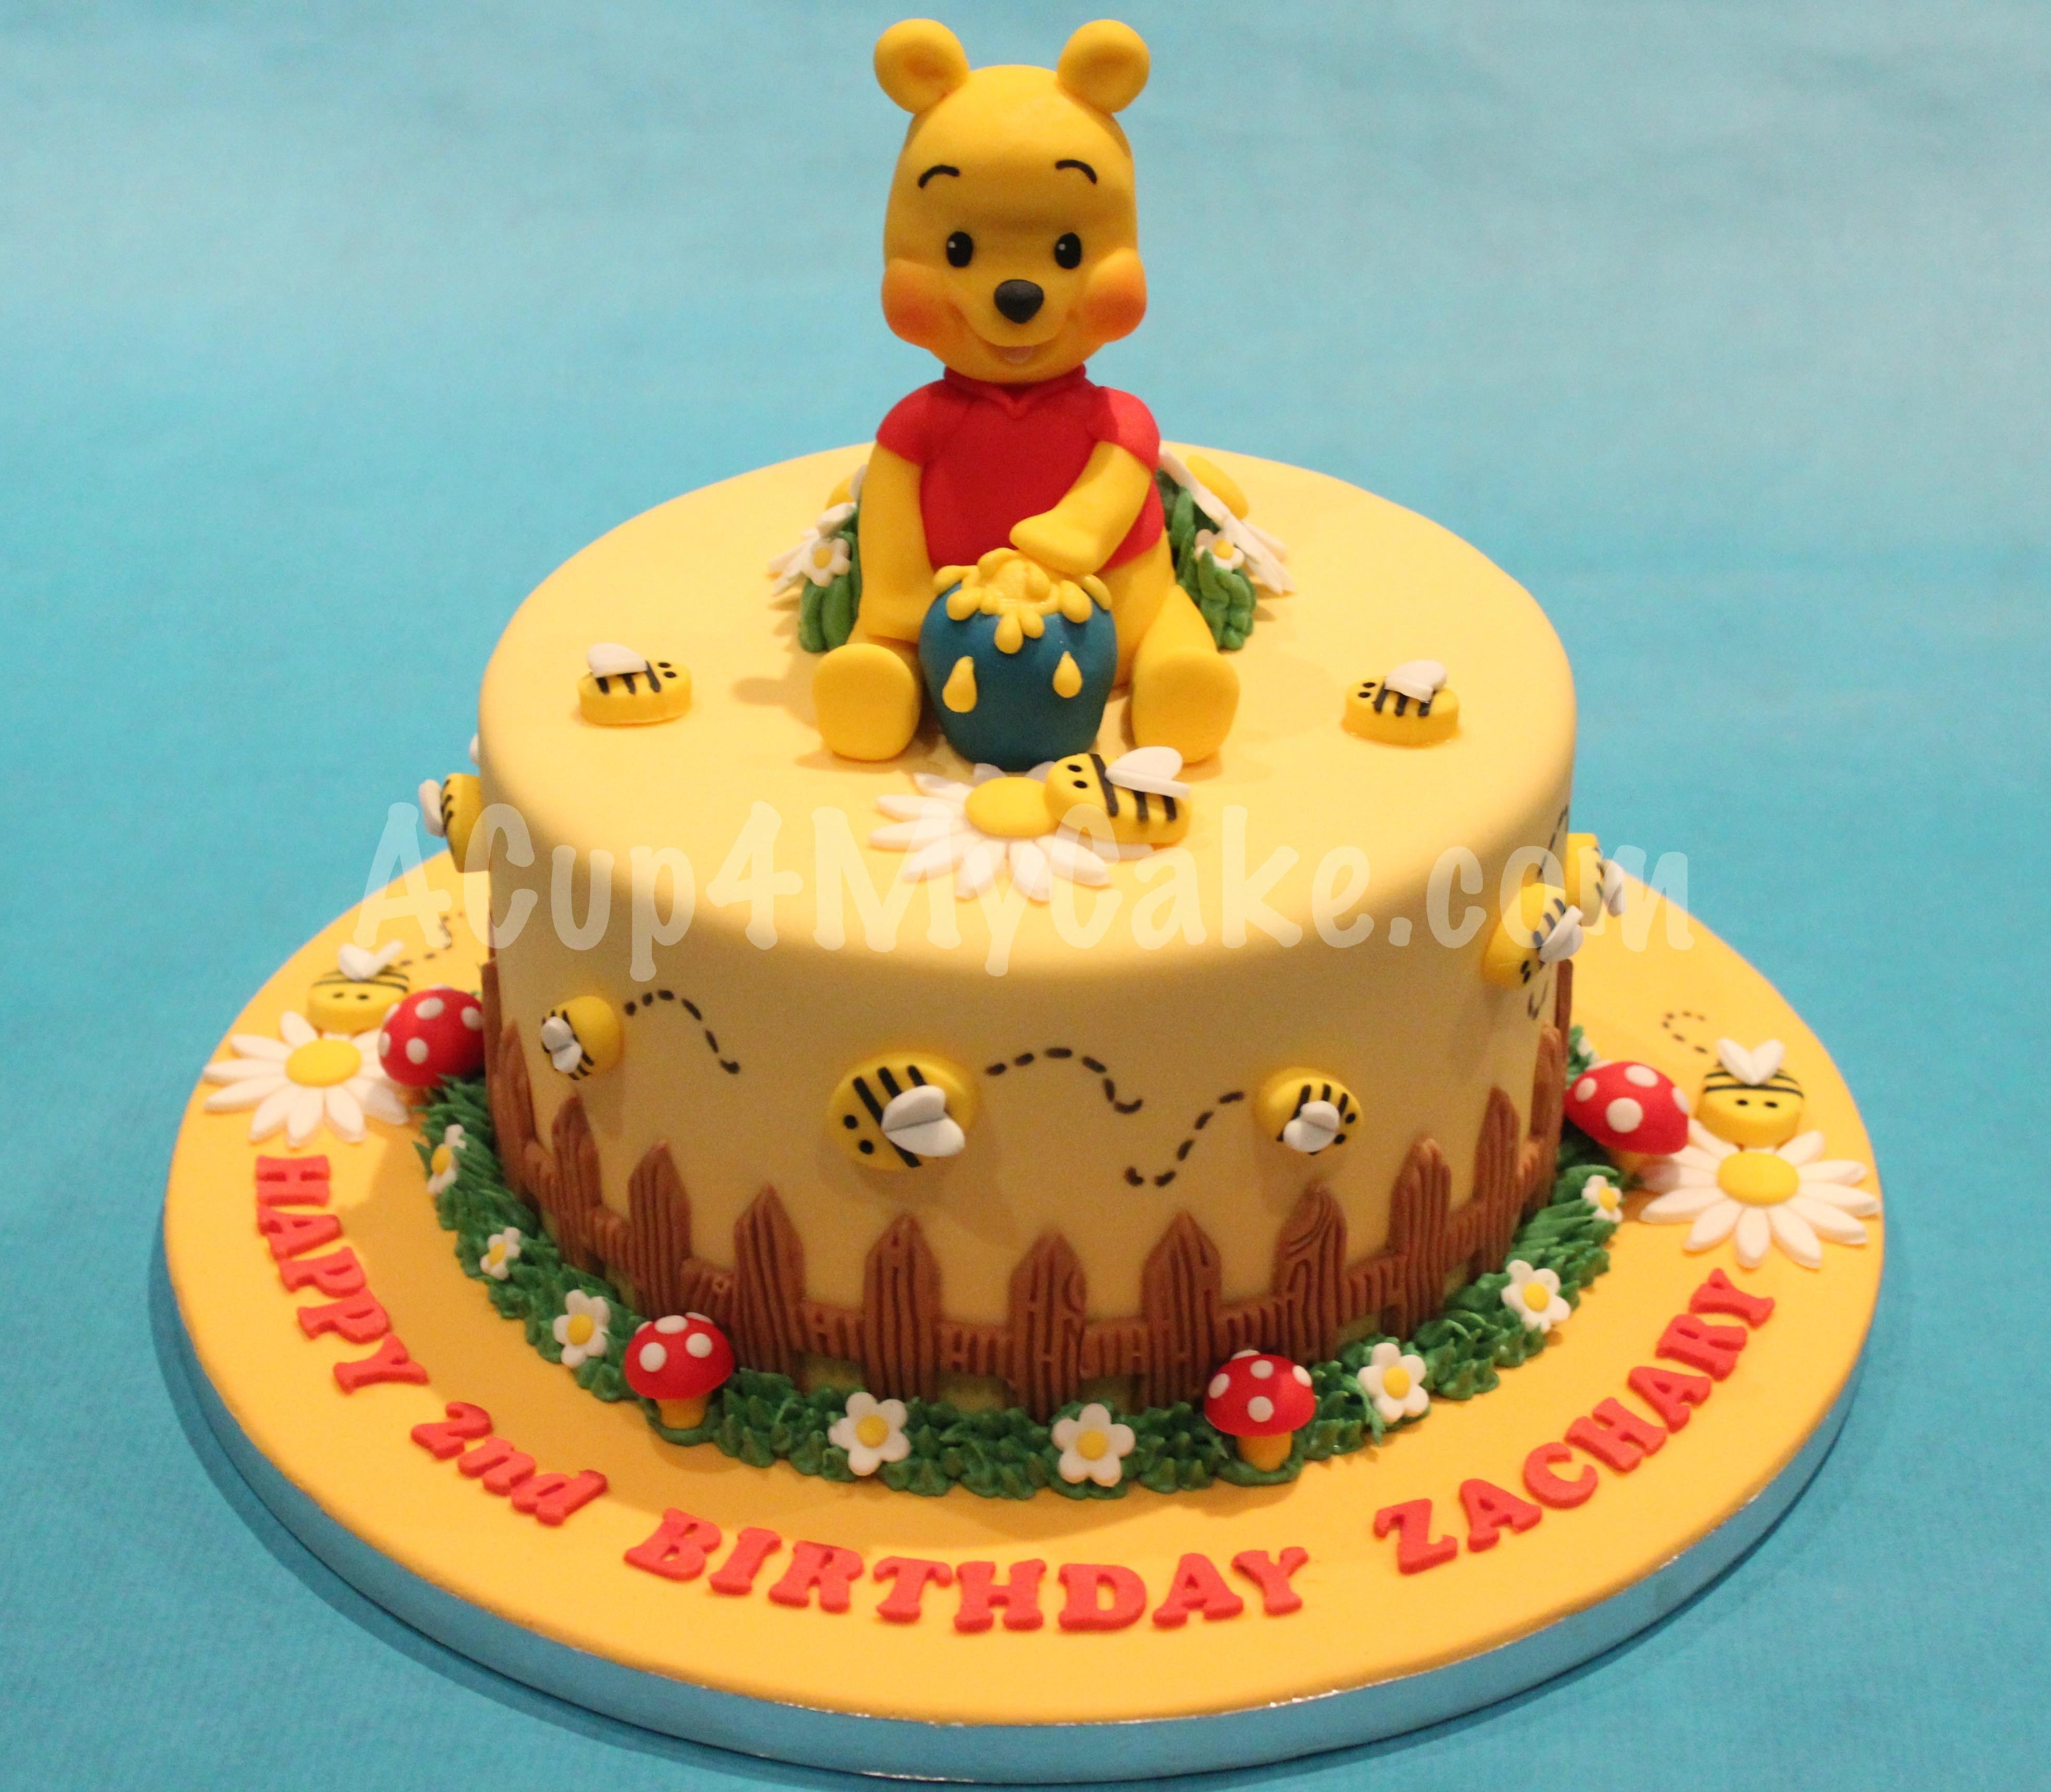 10 Fantastic Winnie The Pooh Cake Ideas winnie the pooh cake acup4mycake 2020